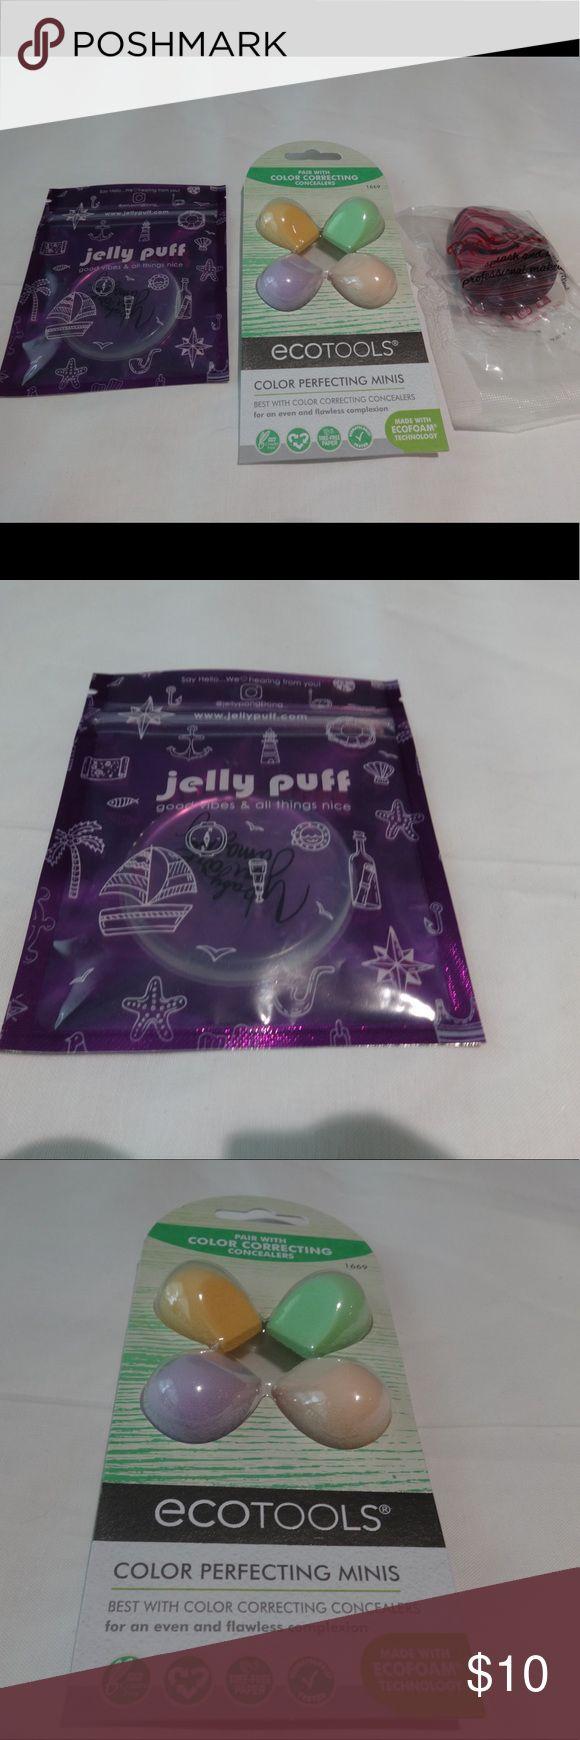 NIB makeup sponges and blenders NIB new Jelly Puff